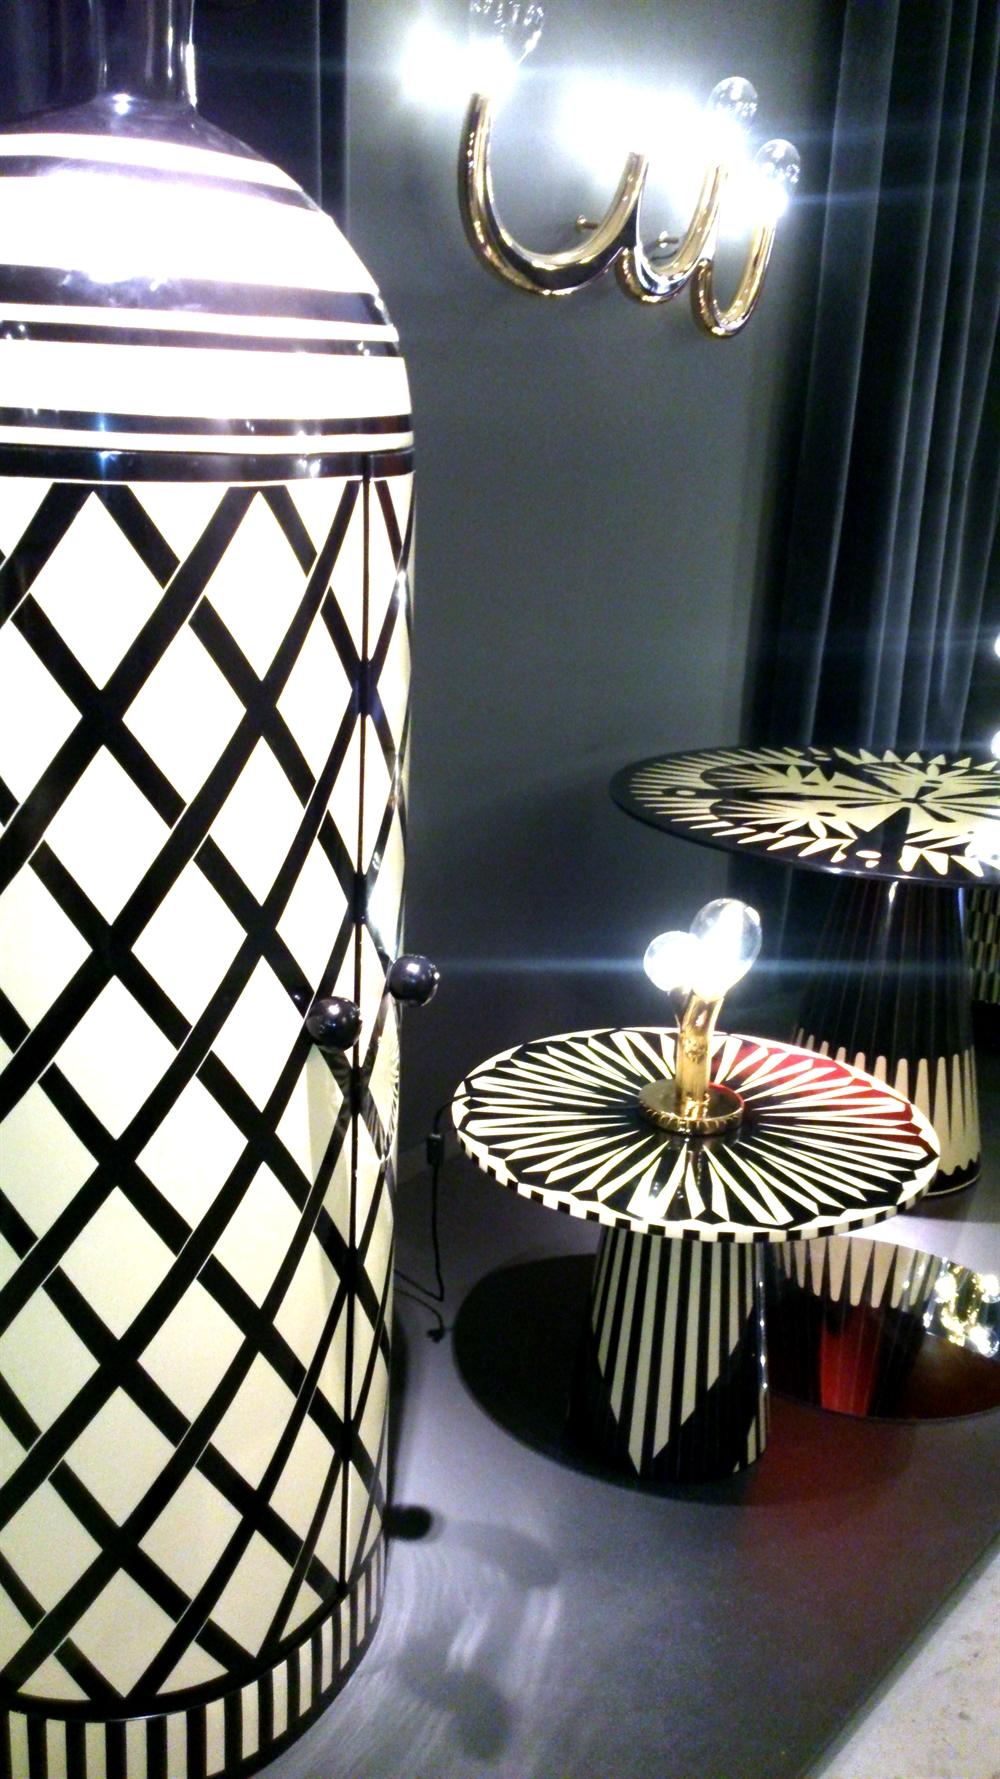 24 fuorisalone milan design week 2015 rossana orlandi nika zupanc gufram marimekko scarlet splendour interior design luxurious furniture meble luksusowe projektowanie marcel wanders